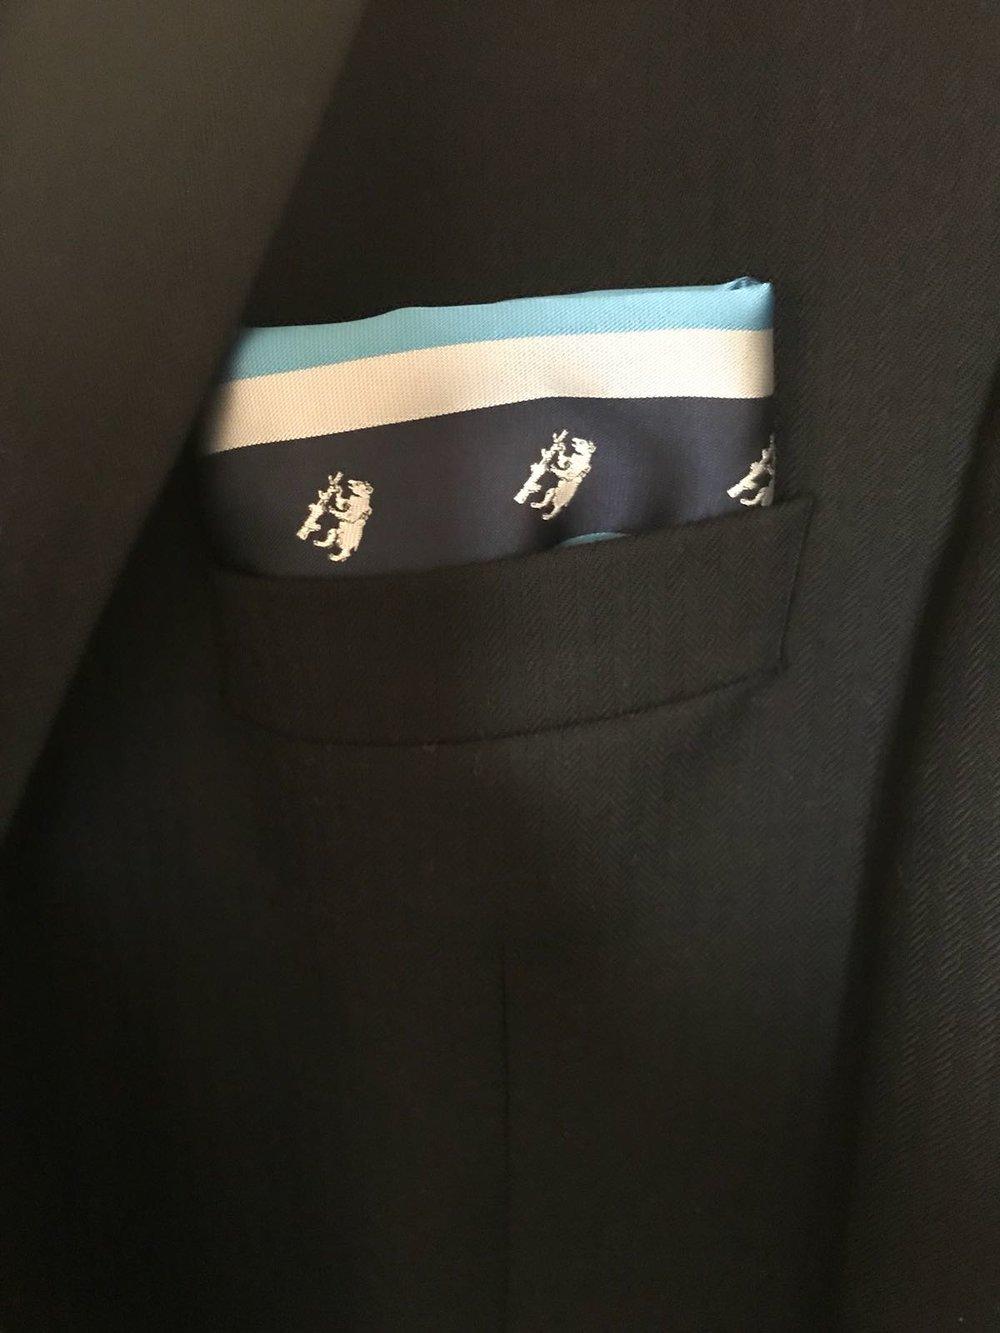 Multibuy Two - Club Tie, Pocket Square and Cufflinks